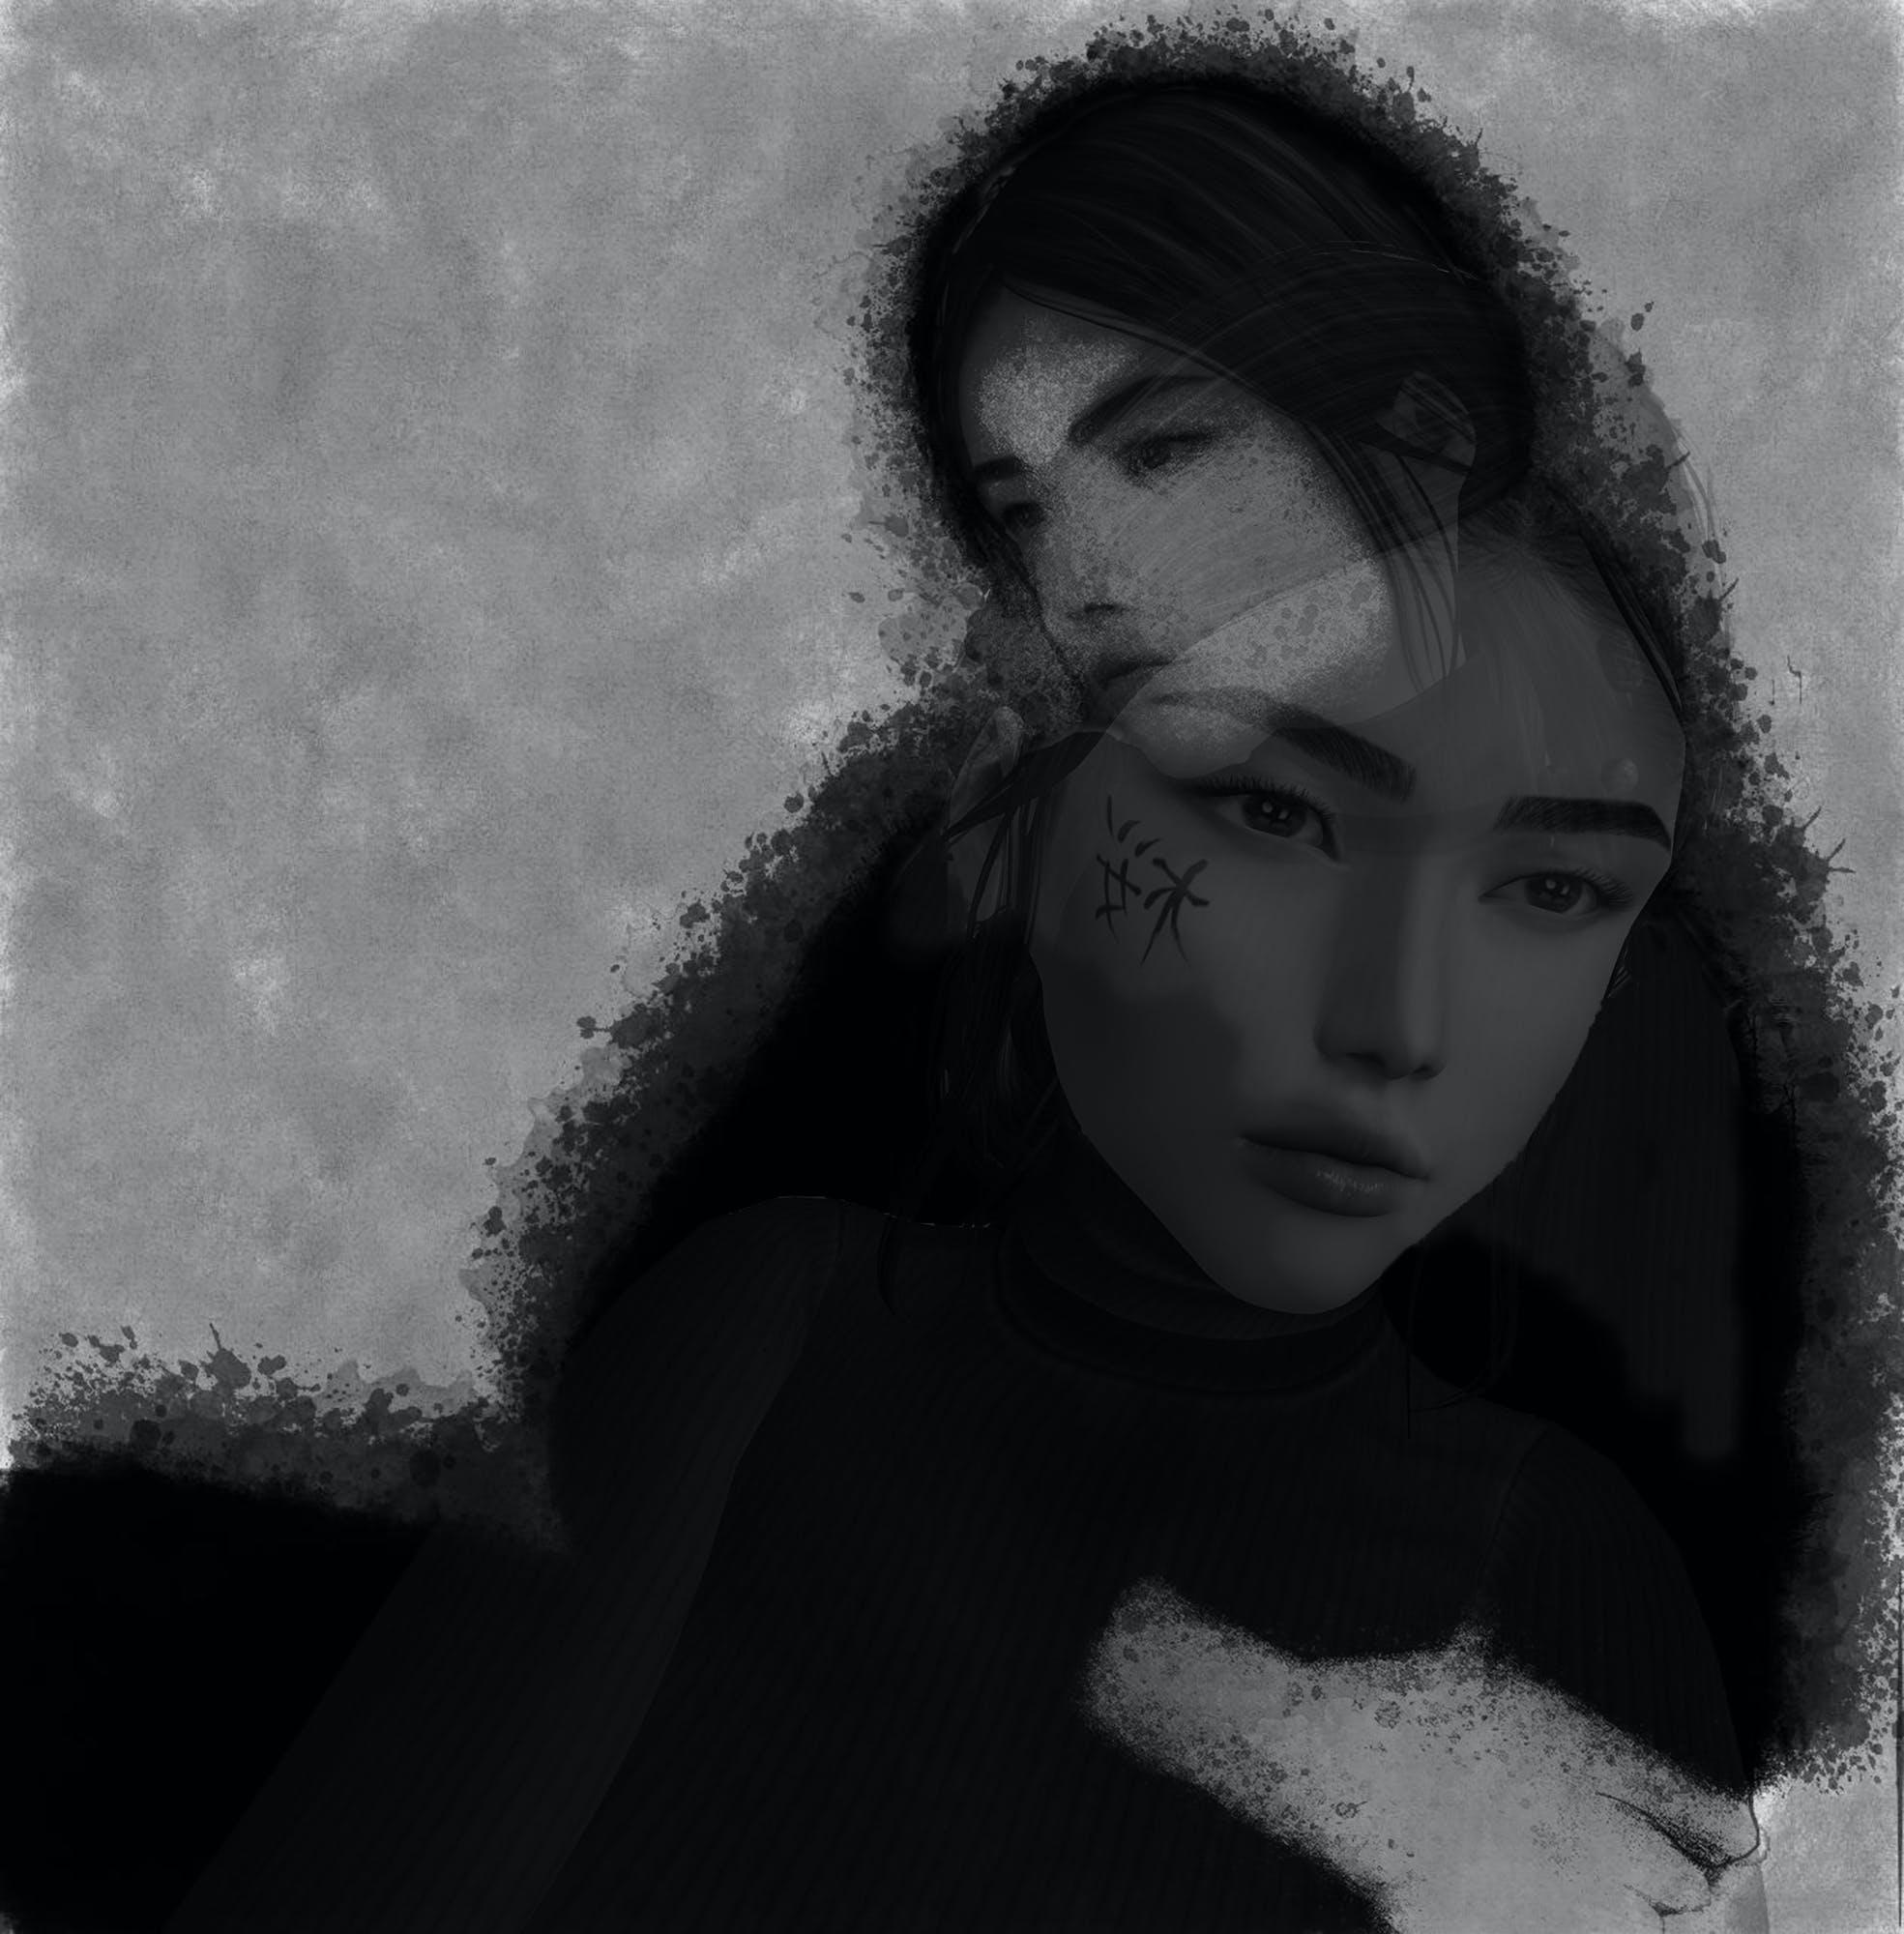 Free stock photo of girl, black and white, digital art